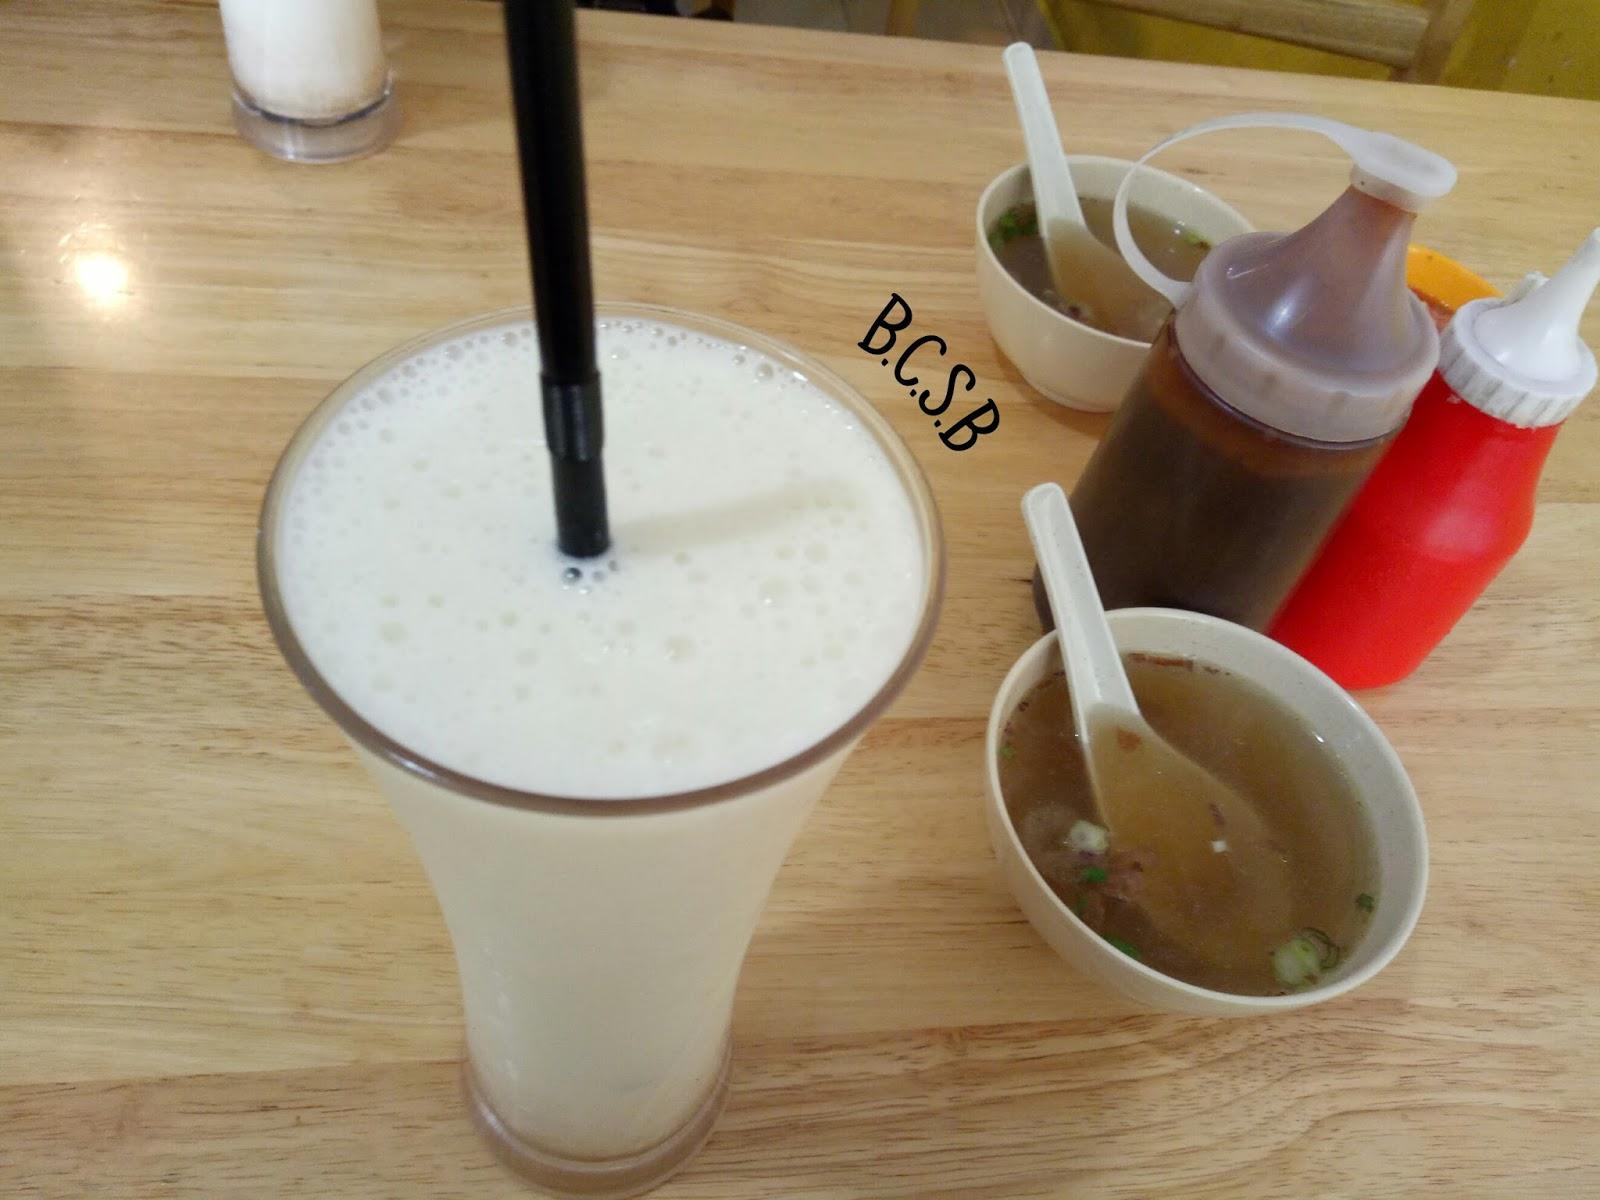 Kedai nasi Arab Al-Amin Food Corner (AFC)